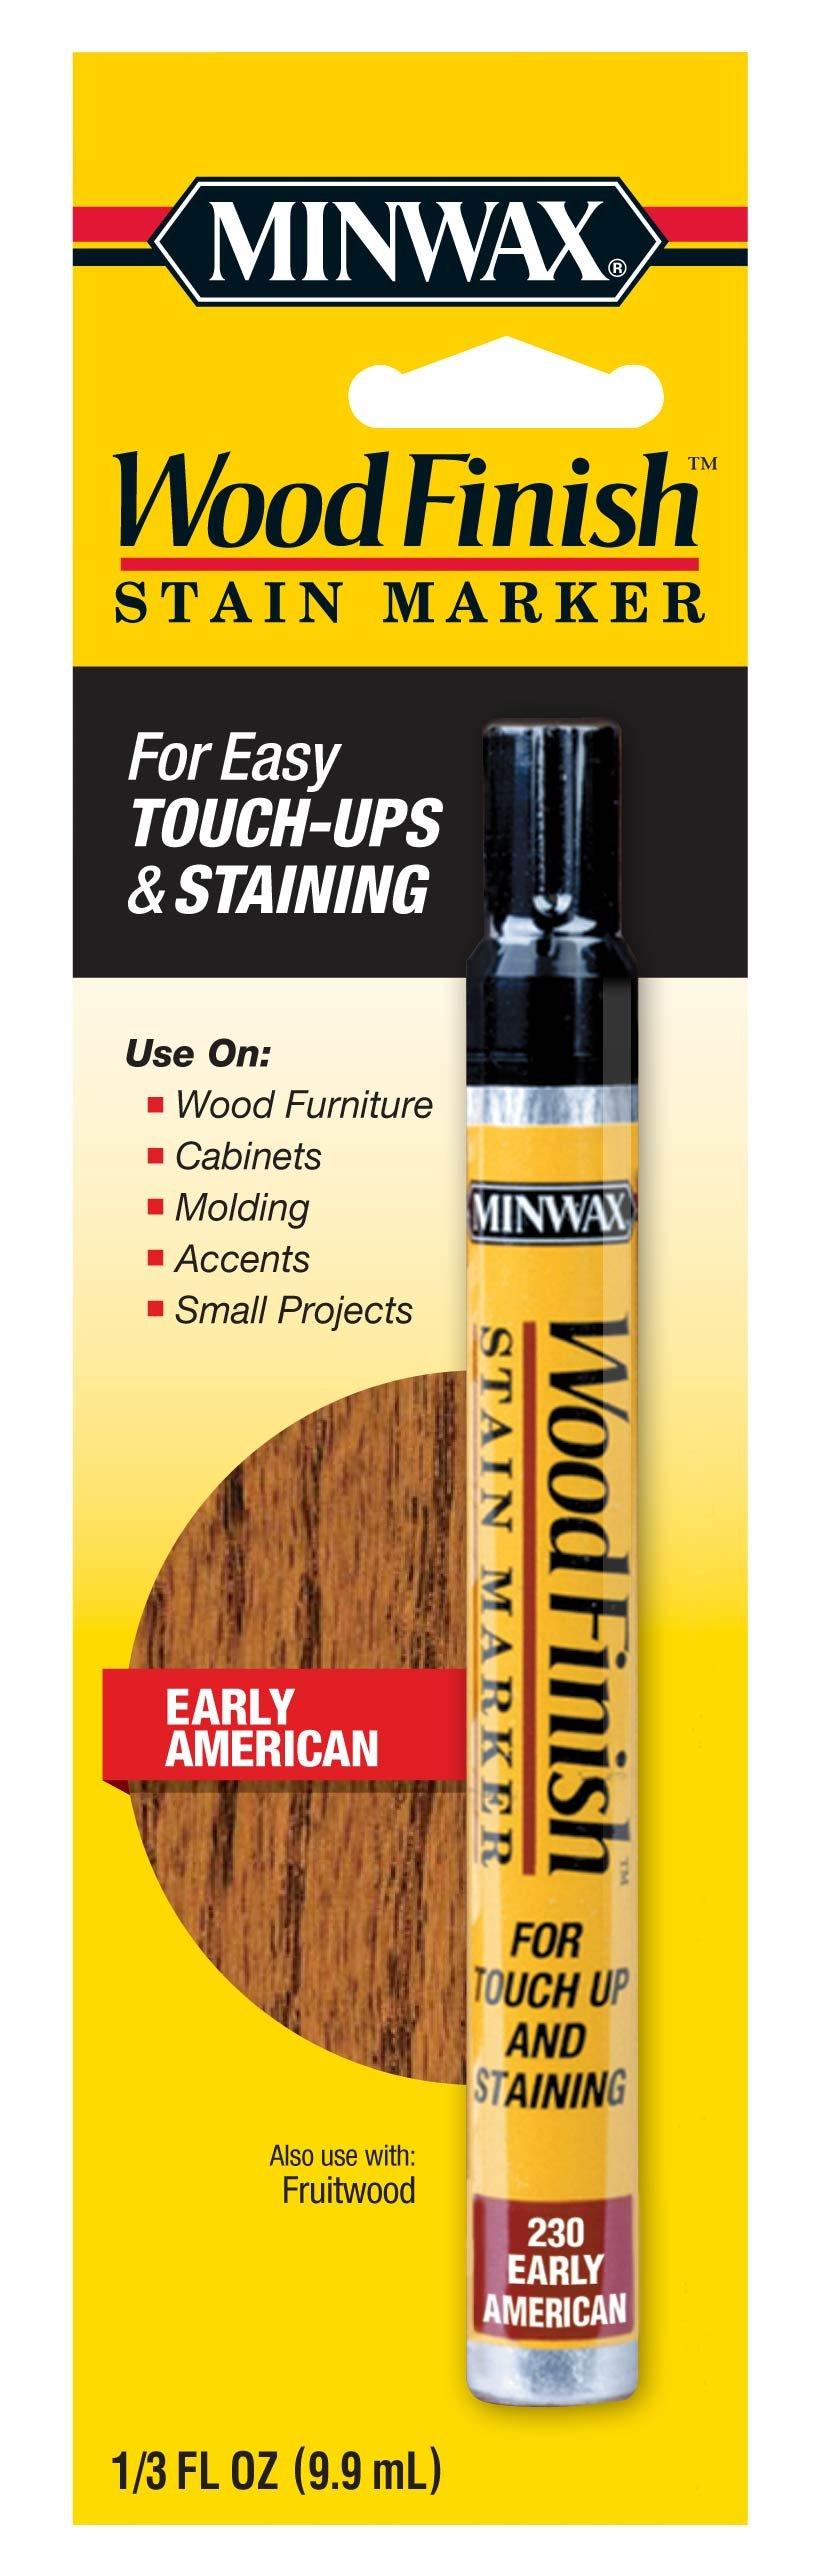 Minwax in legno, finitura legno da interni Early American